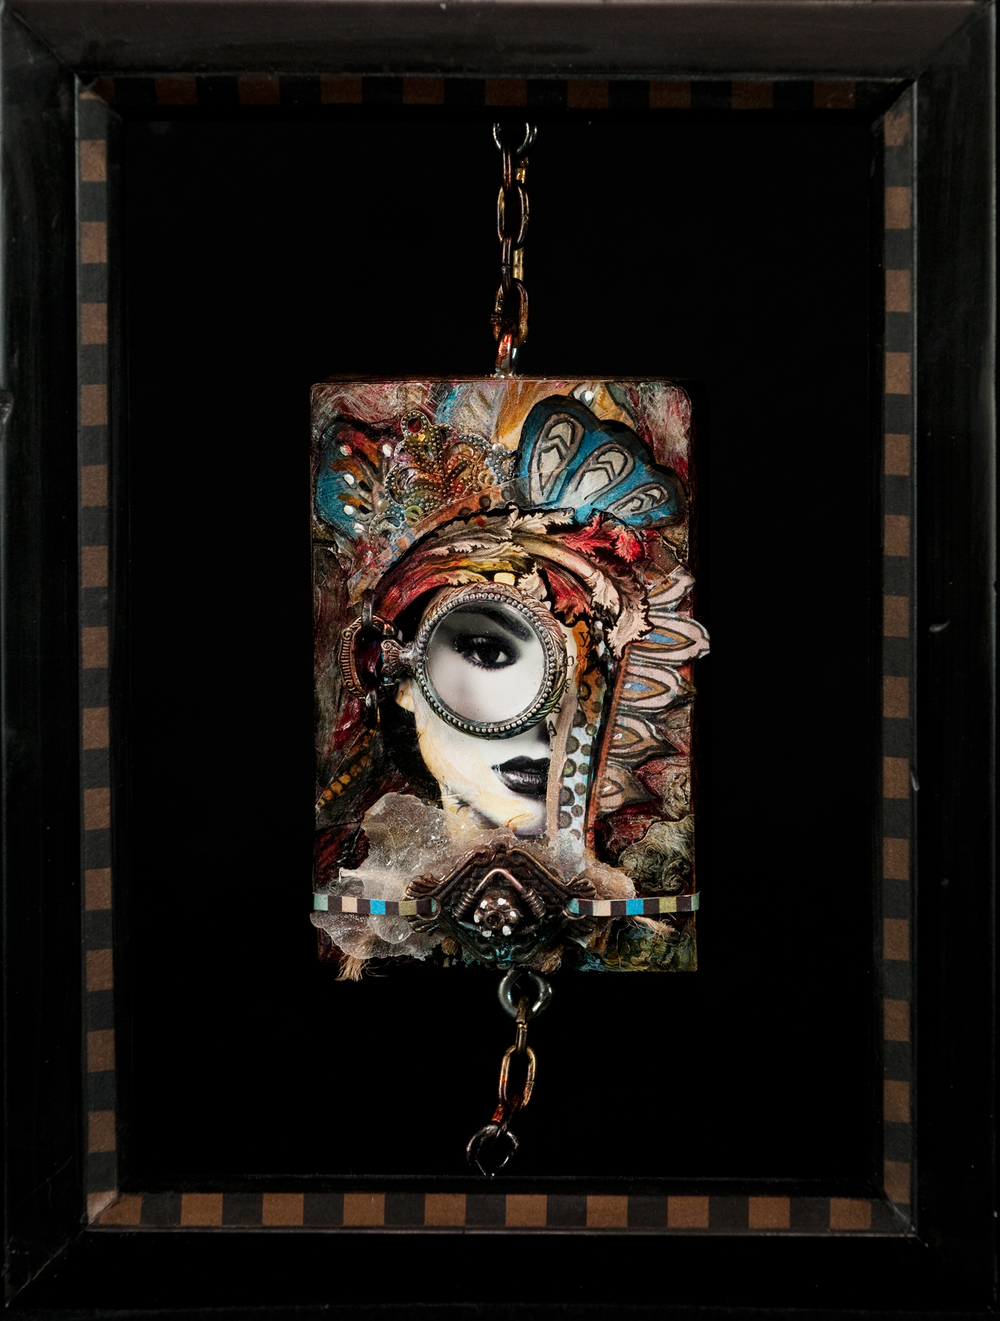 Andrea-Matus-Suspended-Soul-Monosymbollic.jpg